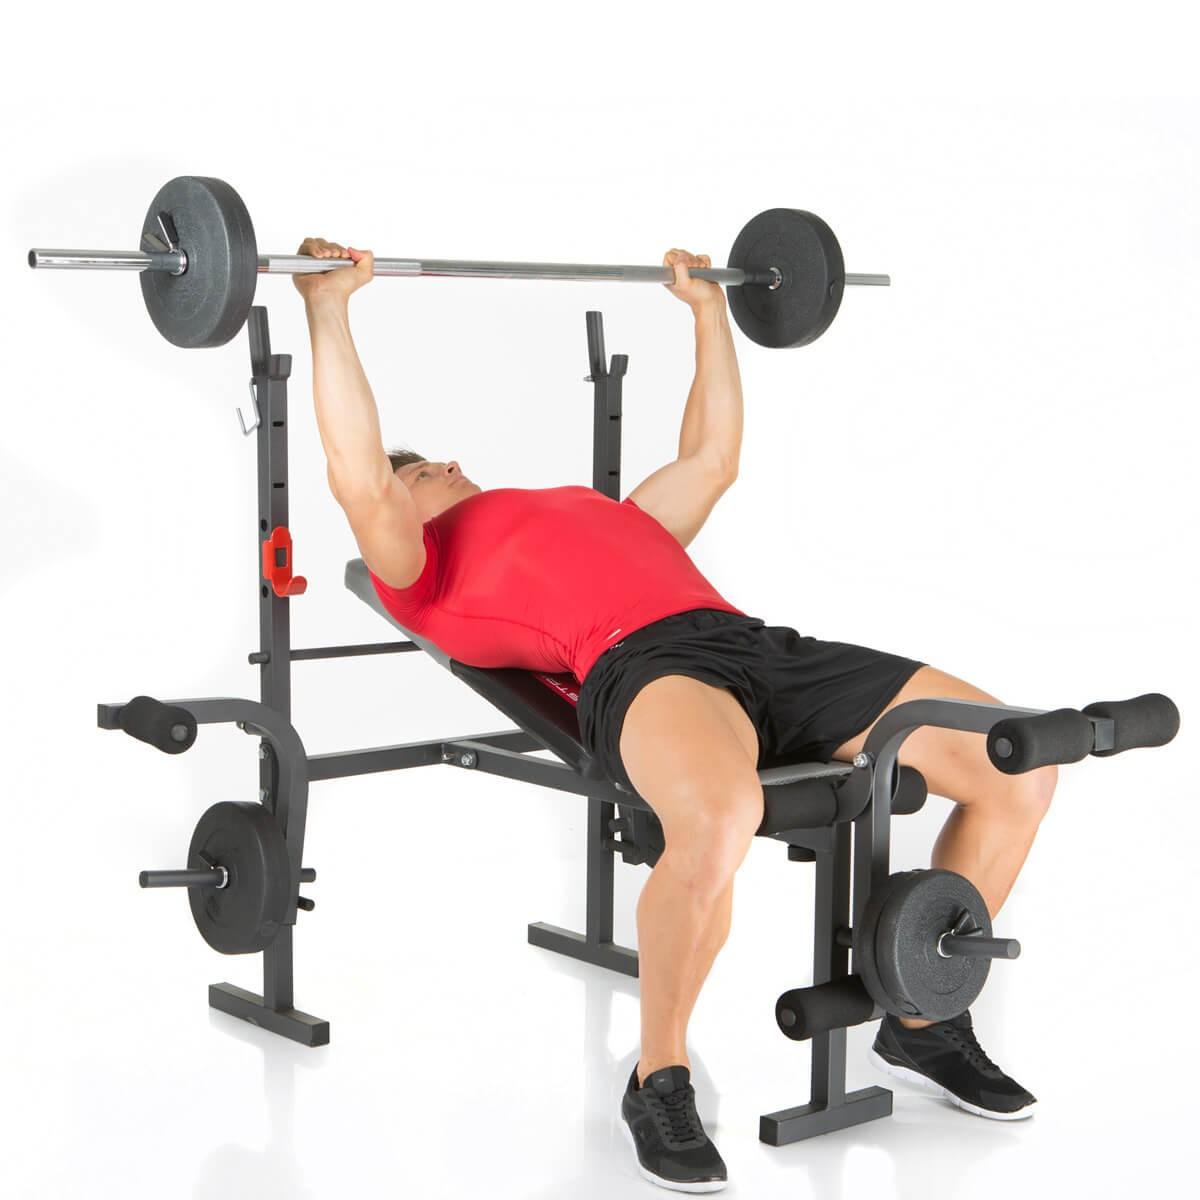 Banc de musculation bermuda de hammer avec des poids 25 kg inclus - Poids banc de musculation ...